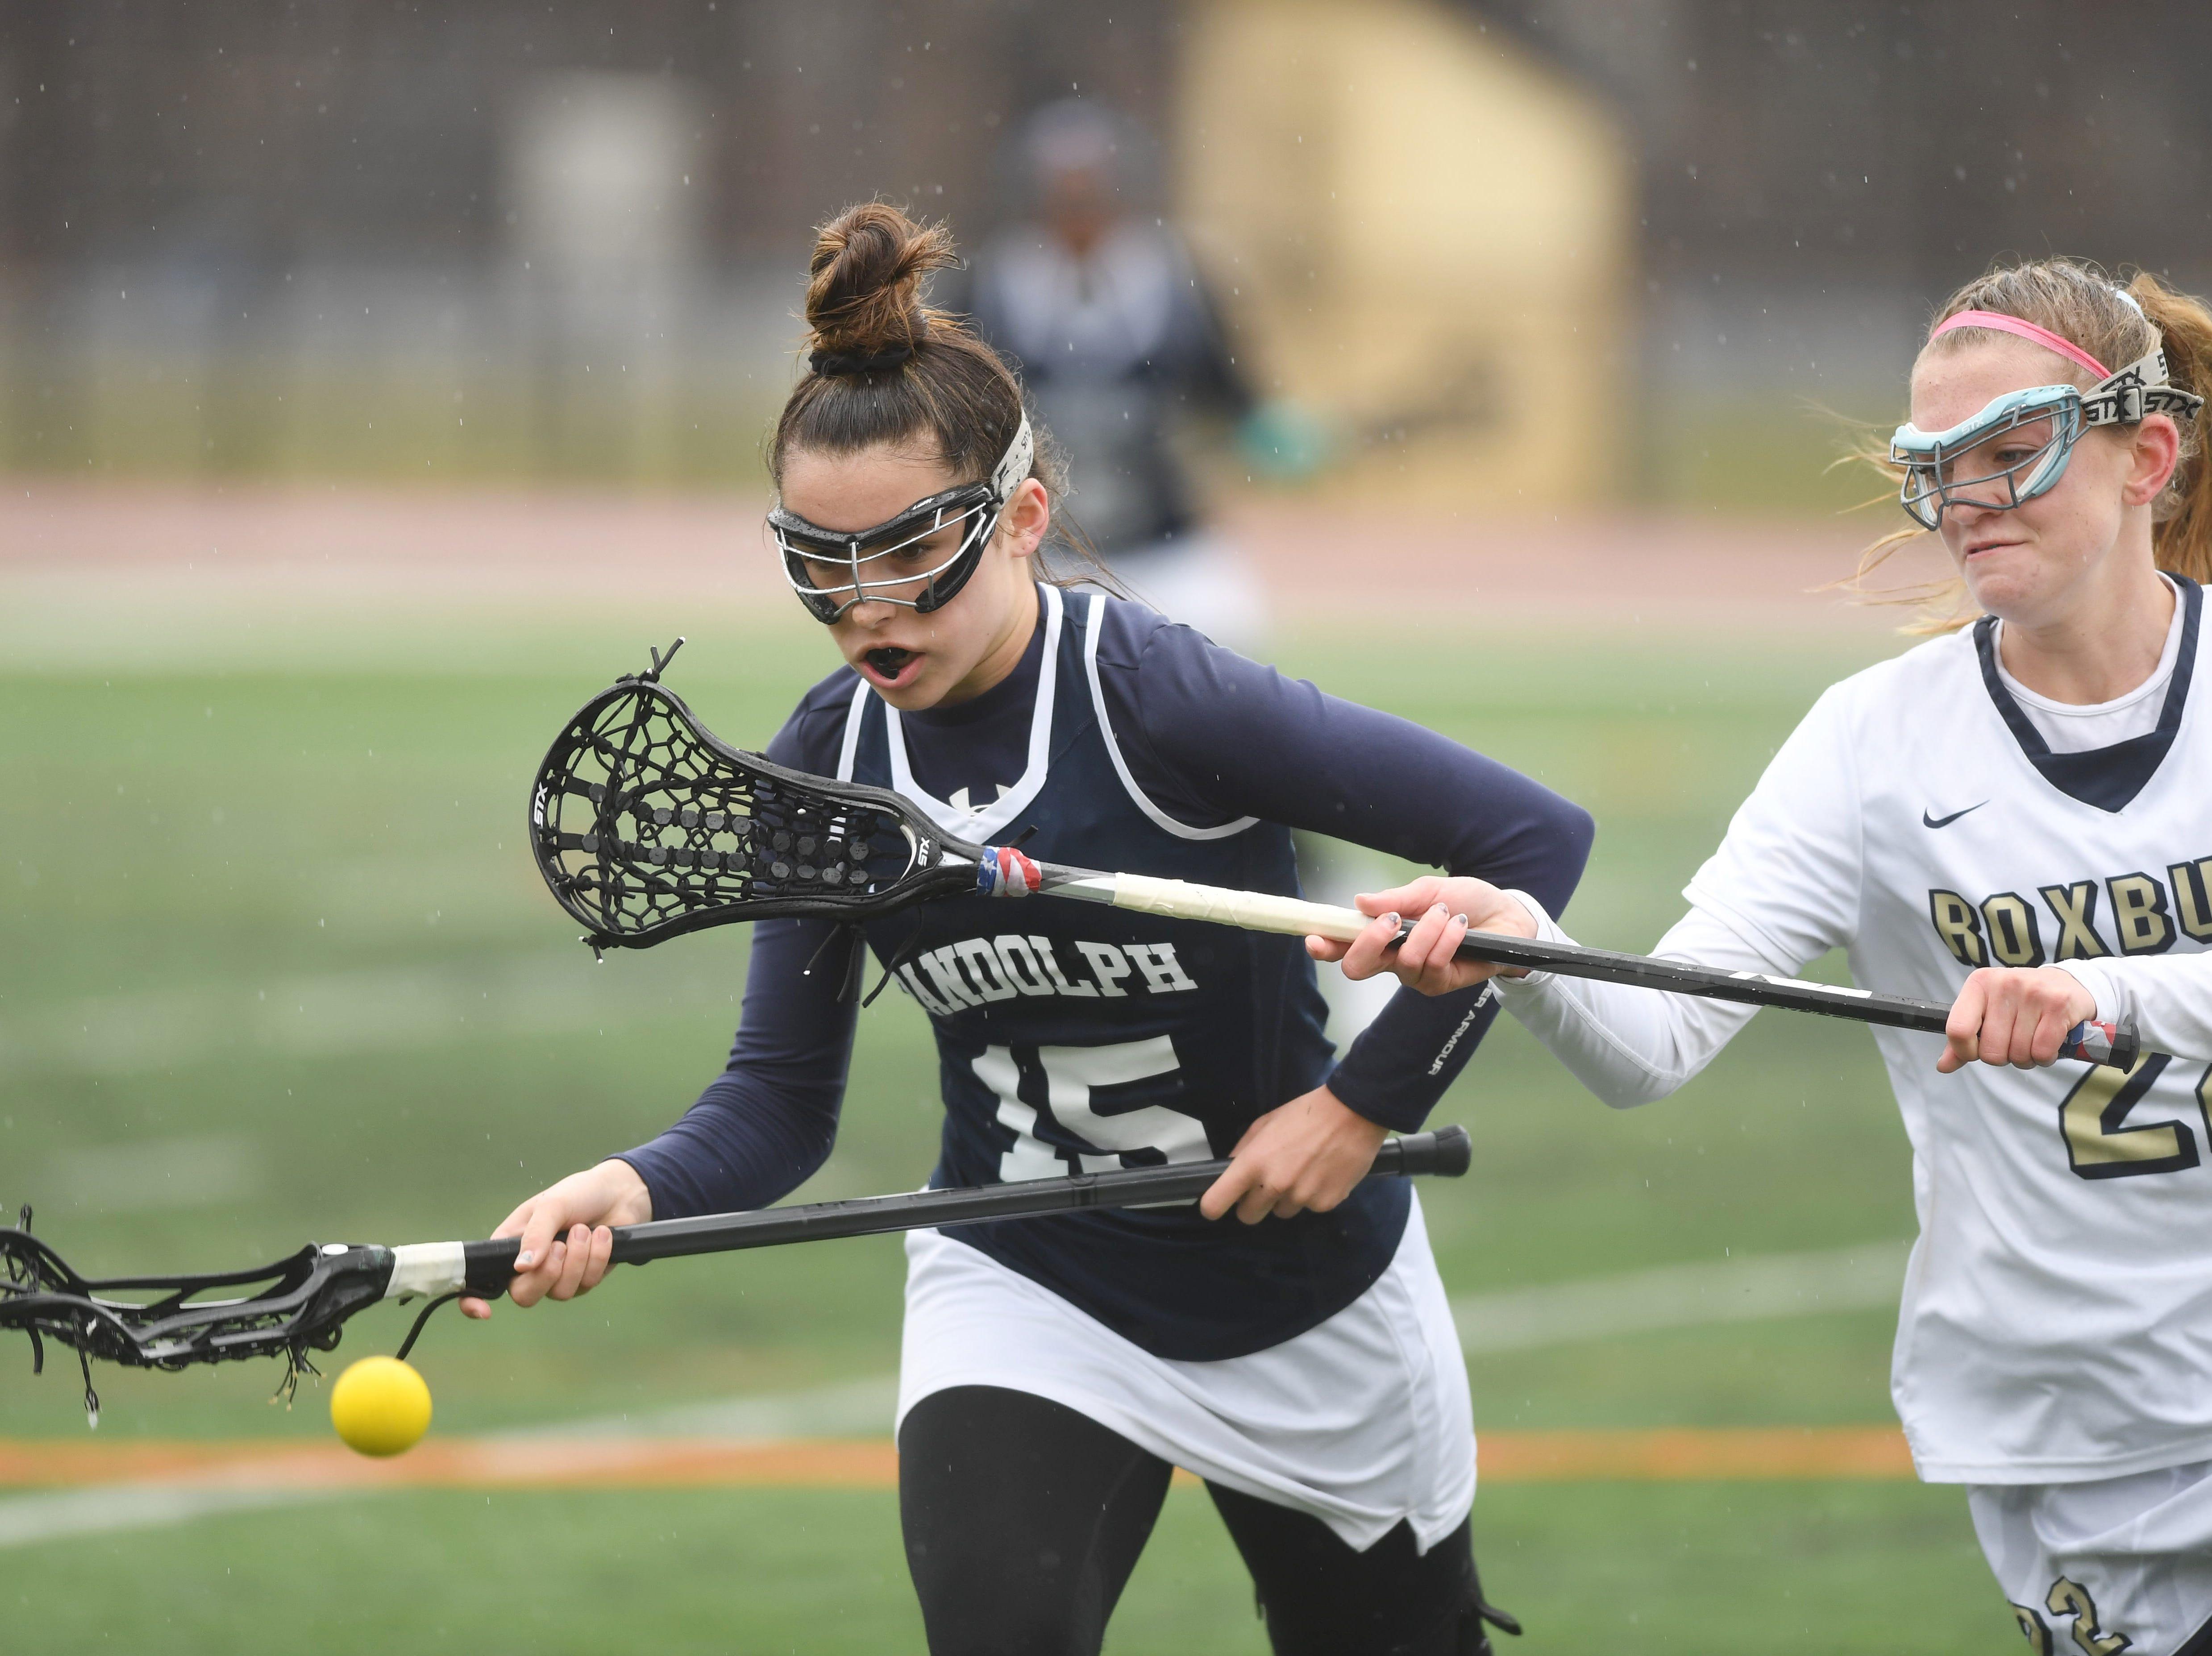 Randolph girls lacrosse at Roxbury on Friday, April 5, 2019. Randolph #15 Kiara Iannacconi and Roxbury #22 Lauren Ernst.